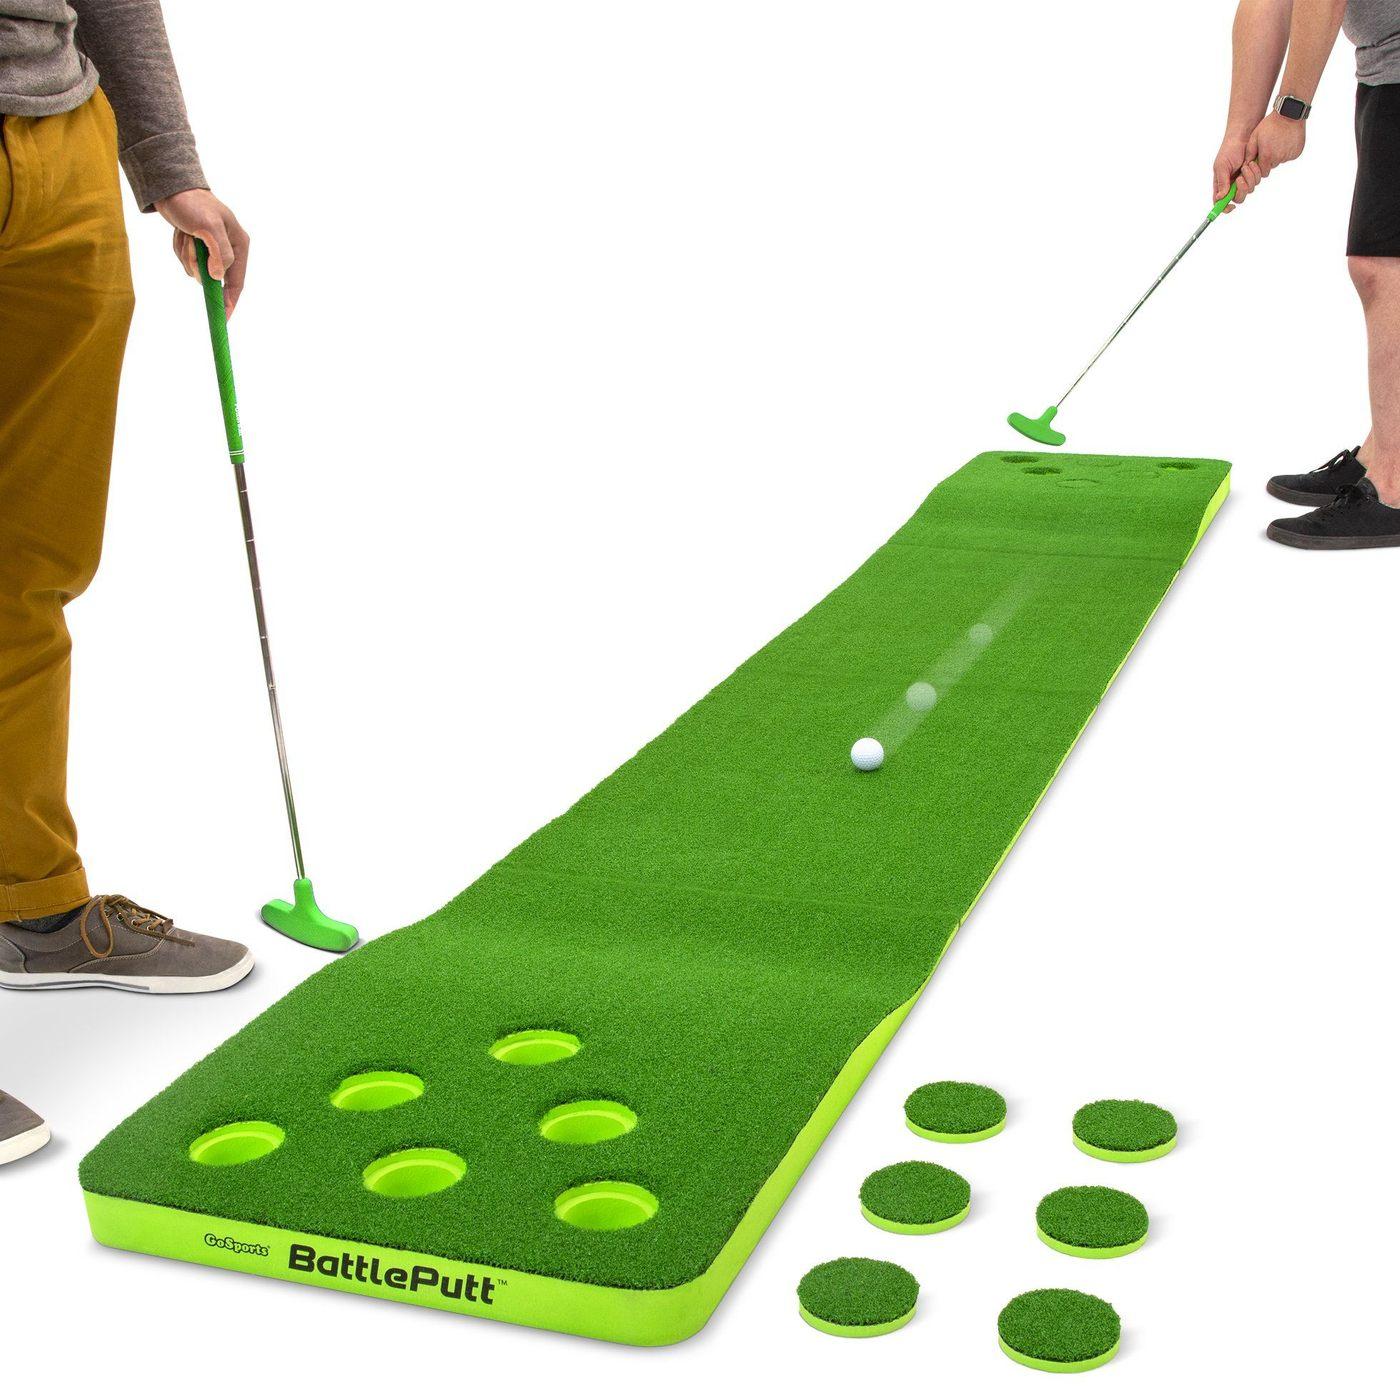 GoSports BattlePutt Pong Inspired Golf Putting Game Image